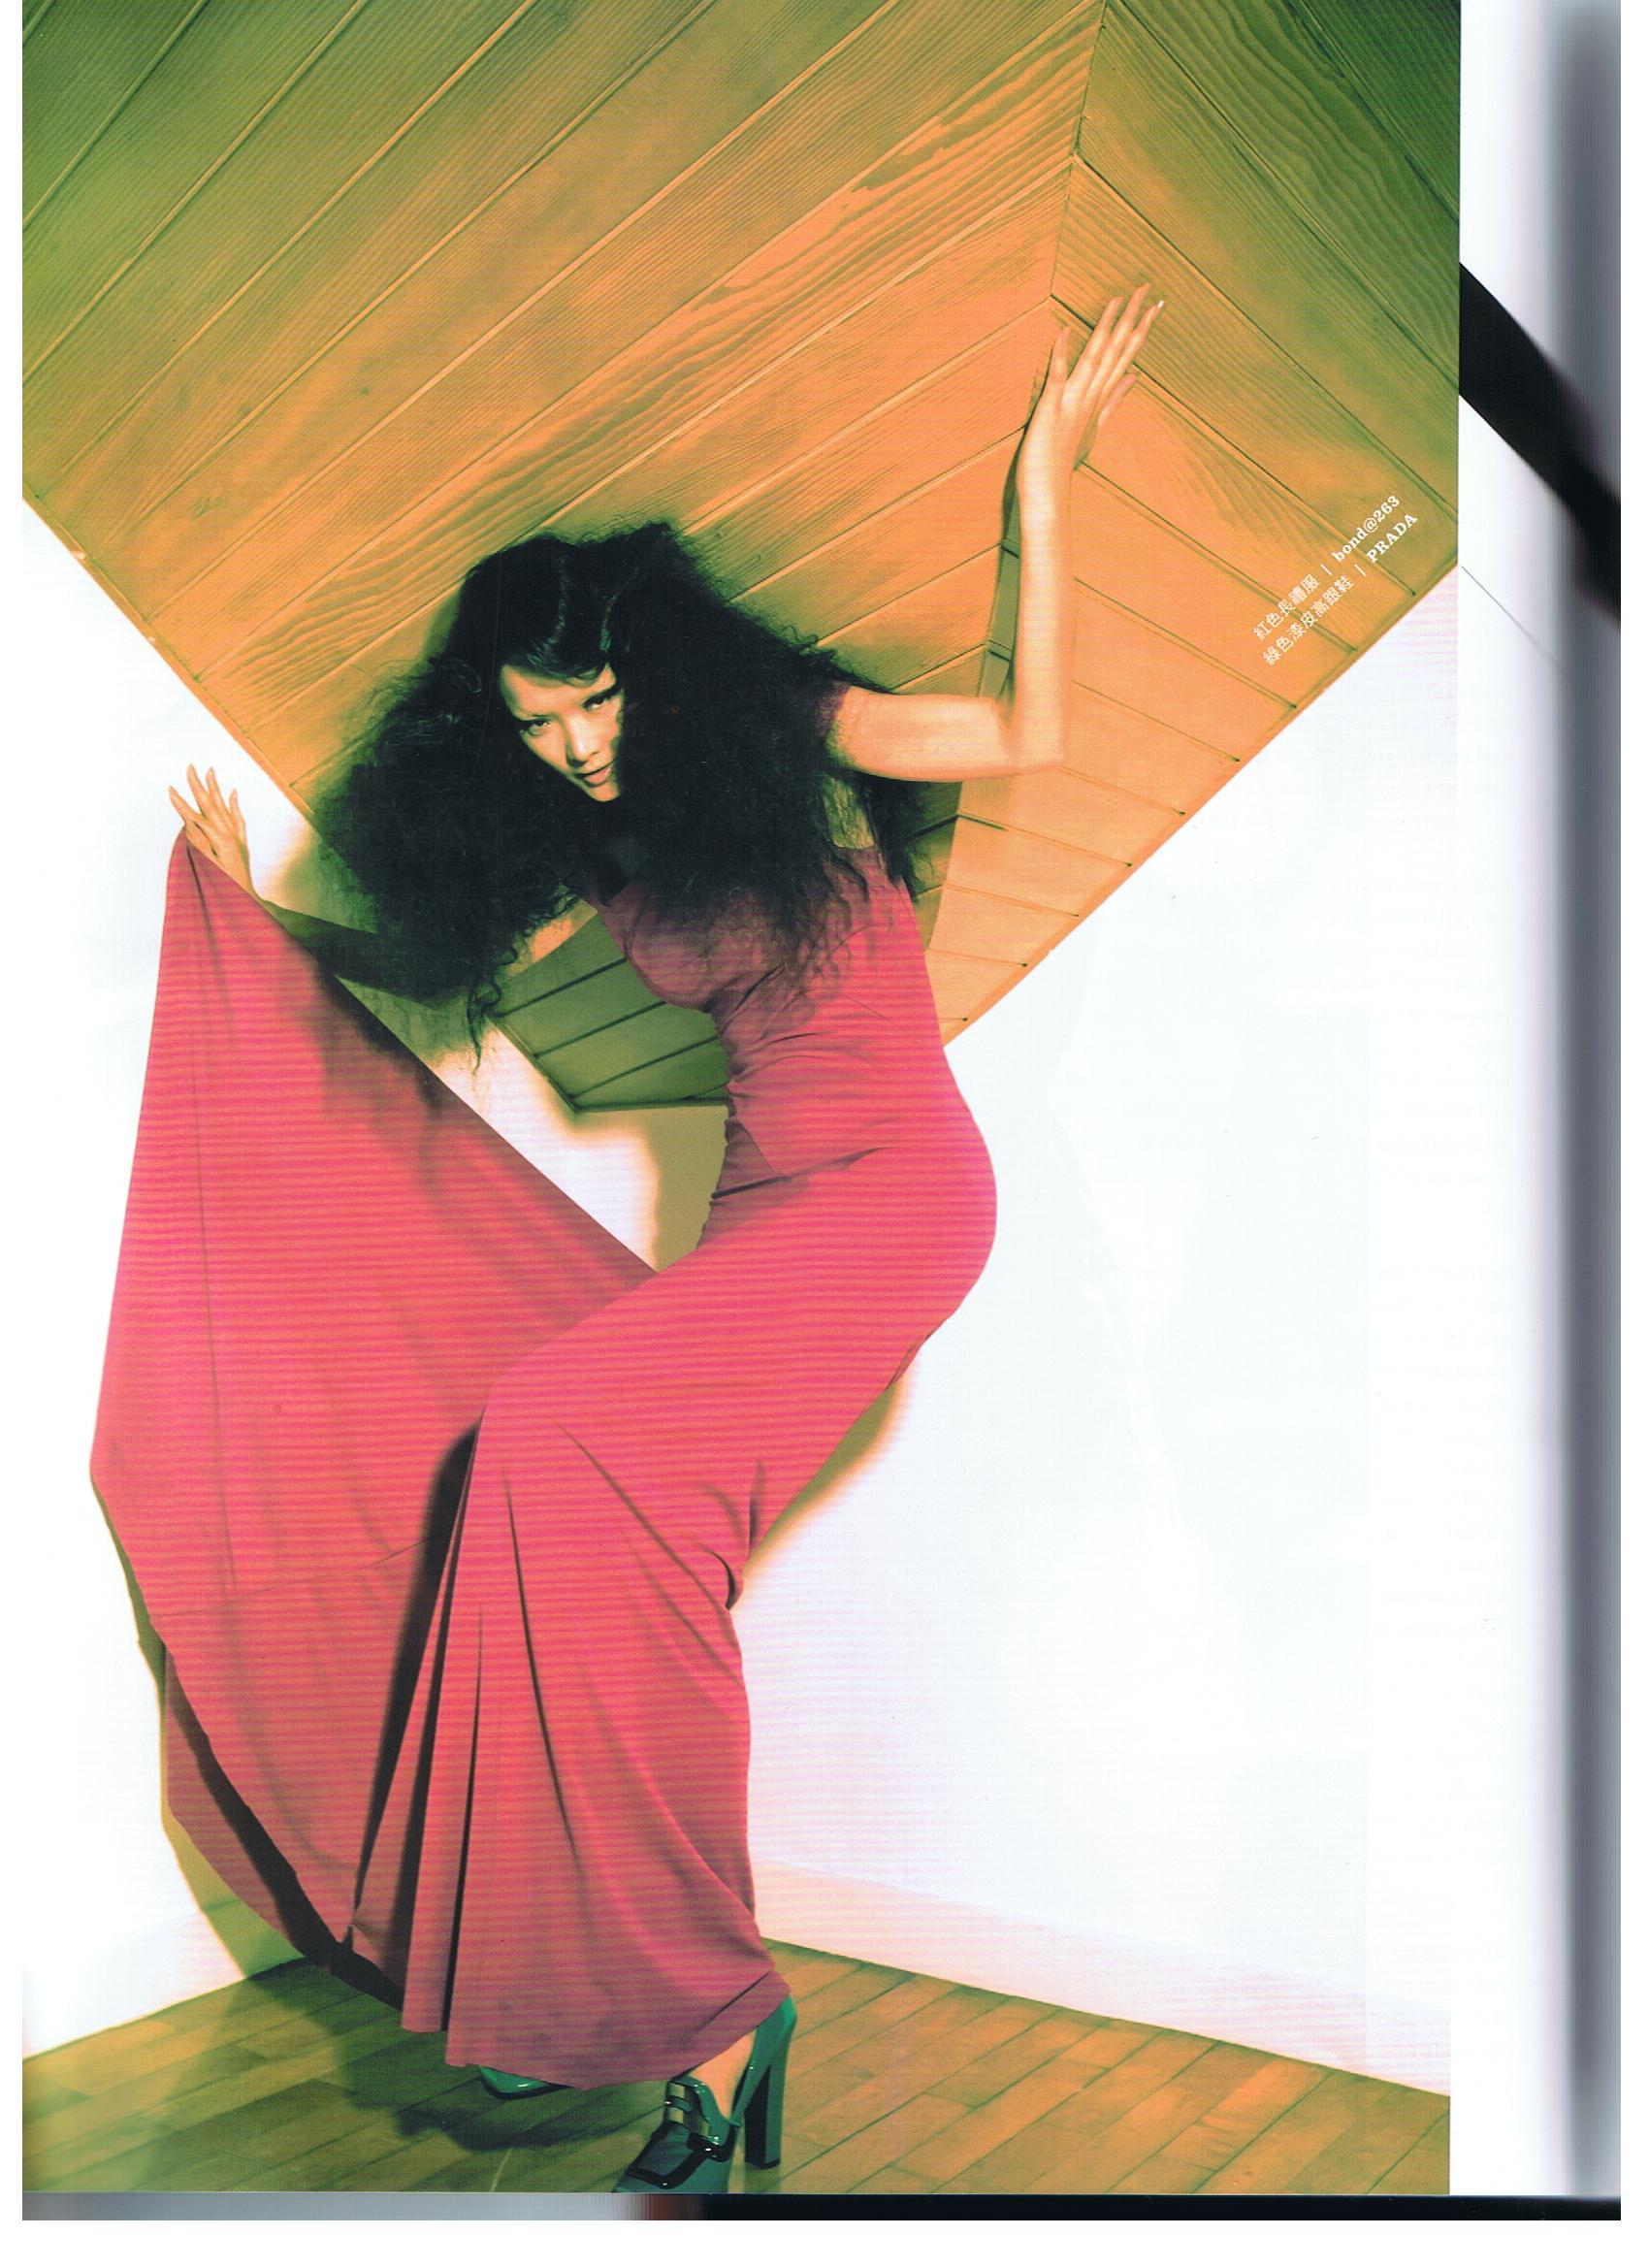 Supermodel: Jing Hsi